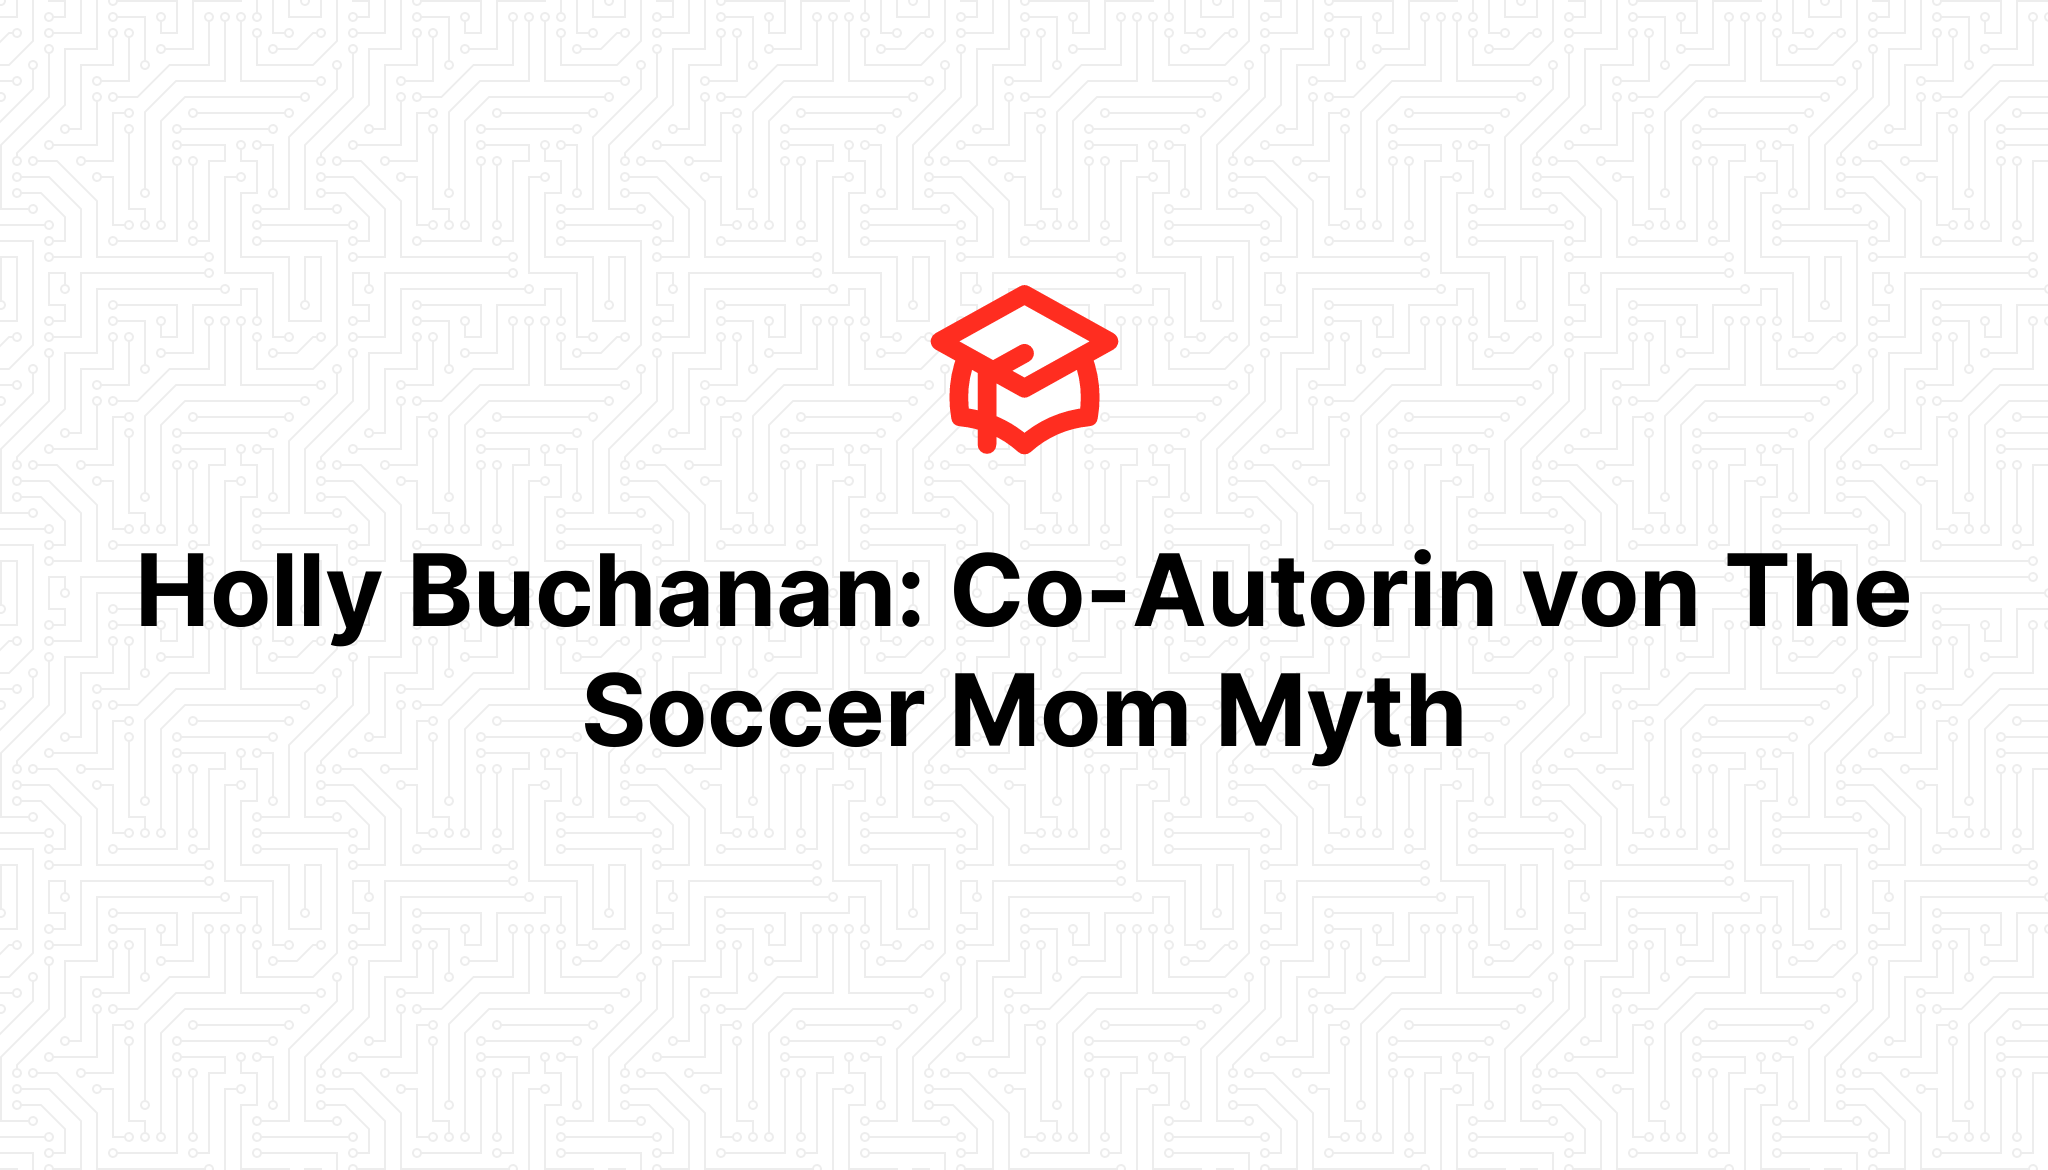 Holly Buchanan: Co-Autorin von The Soccer Mom Myth